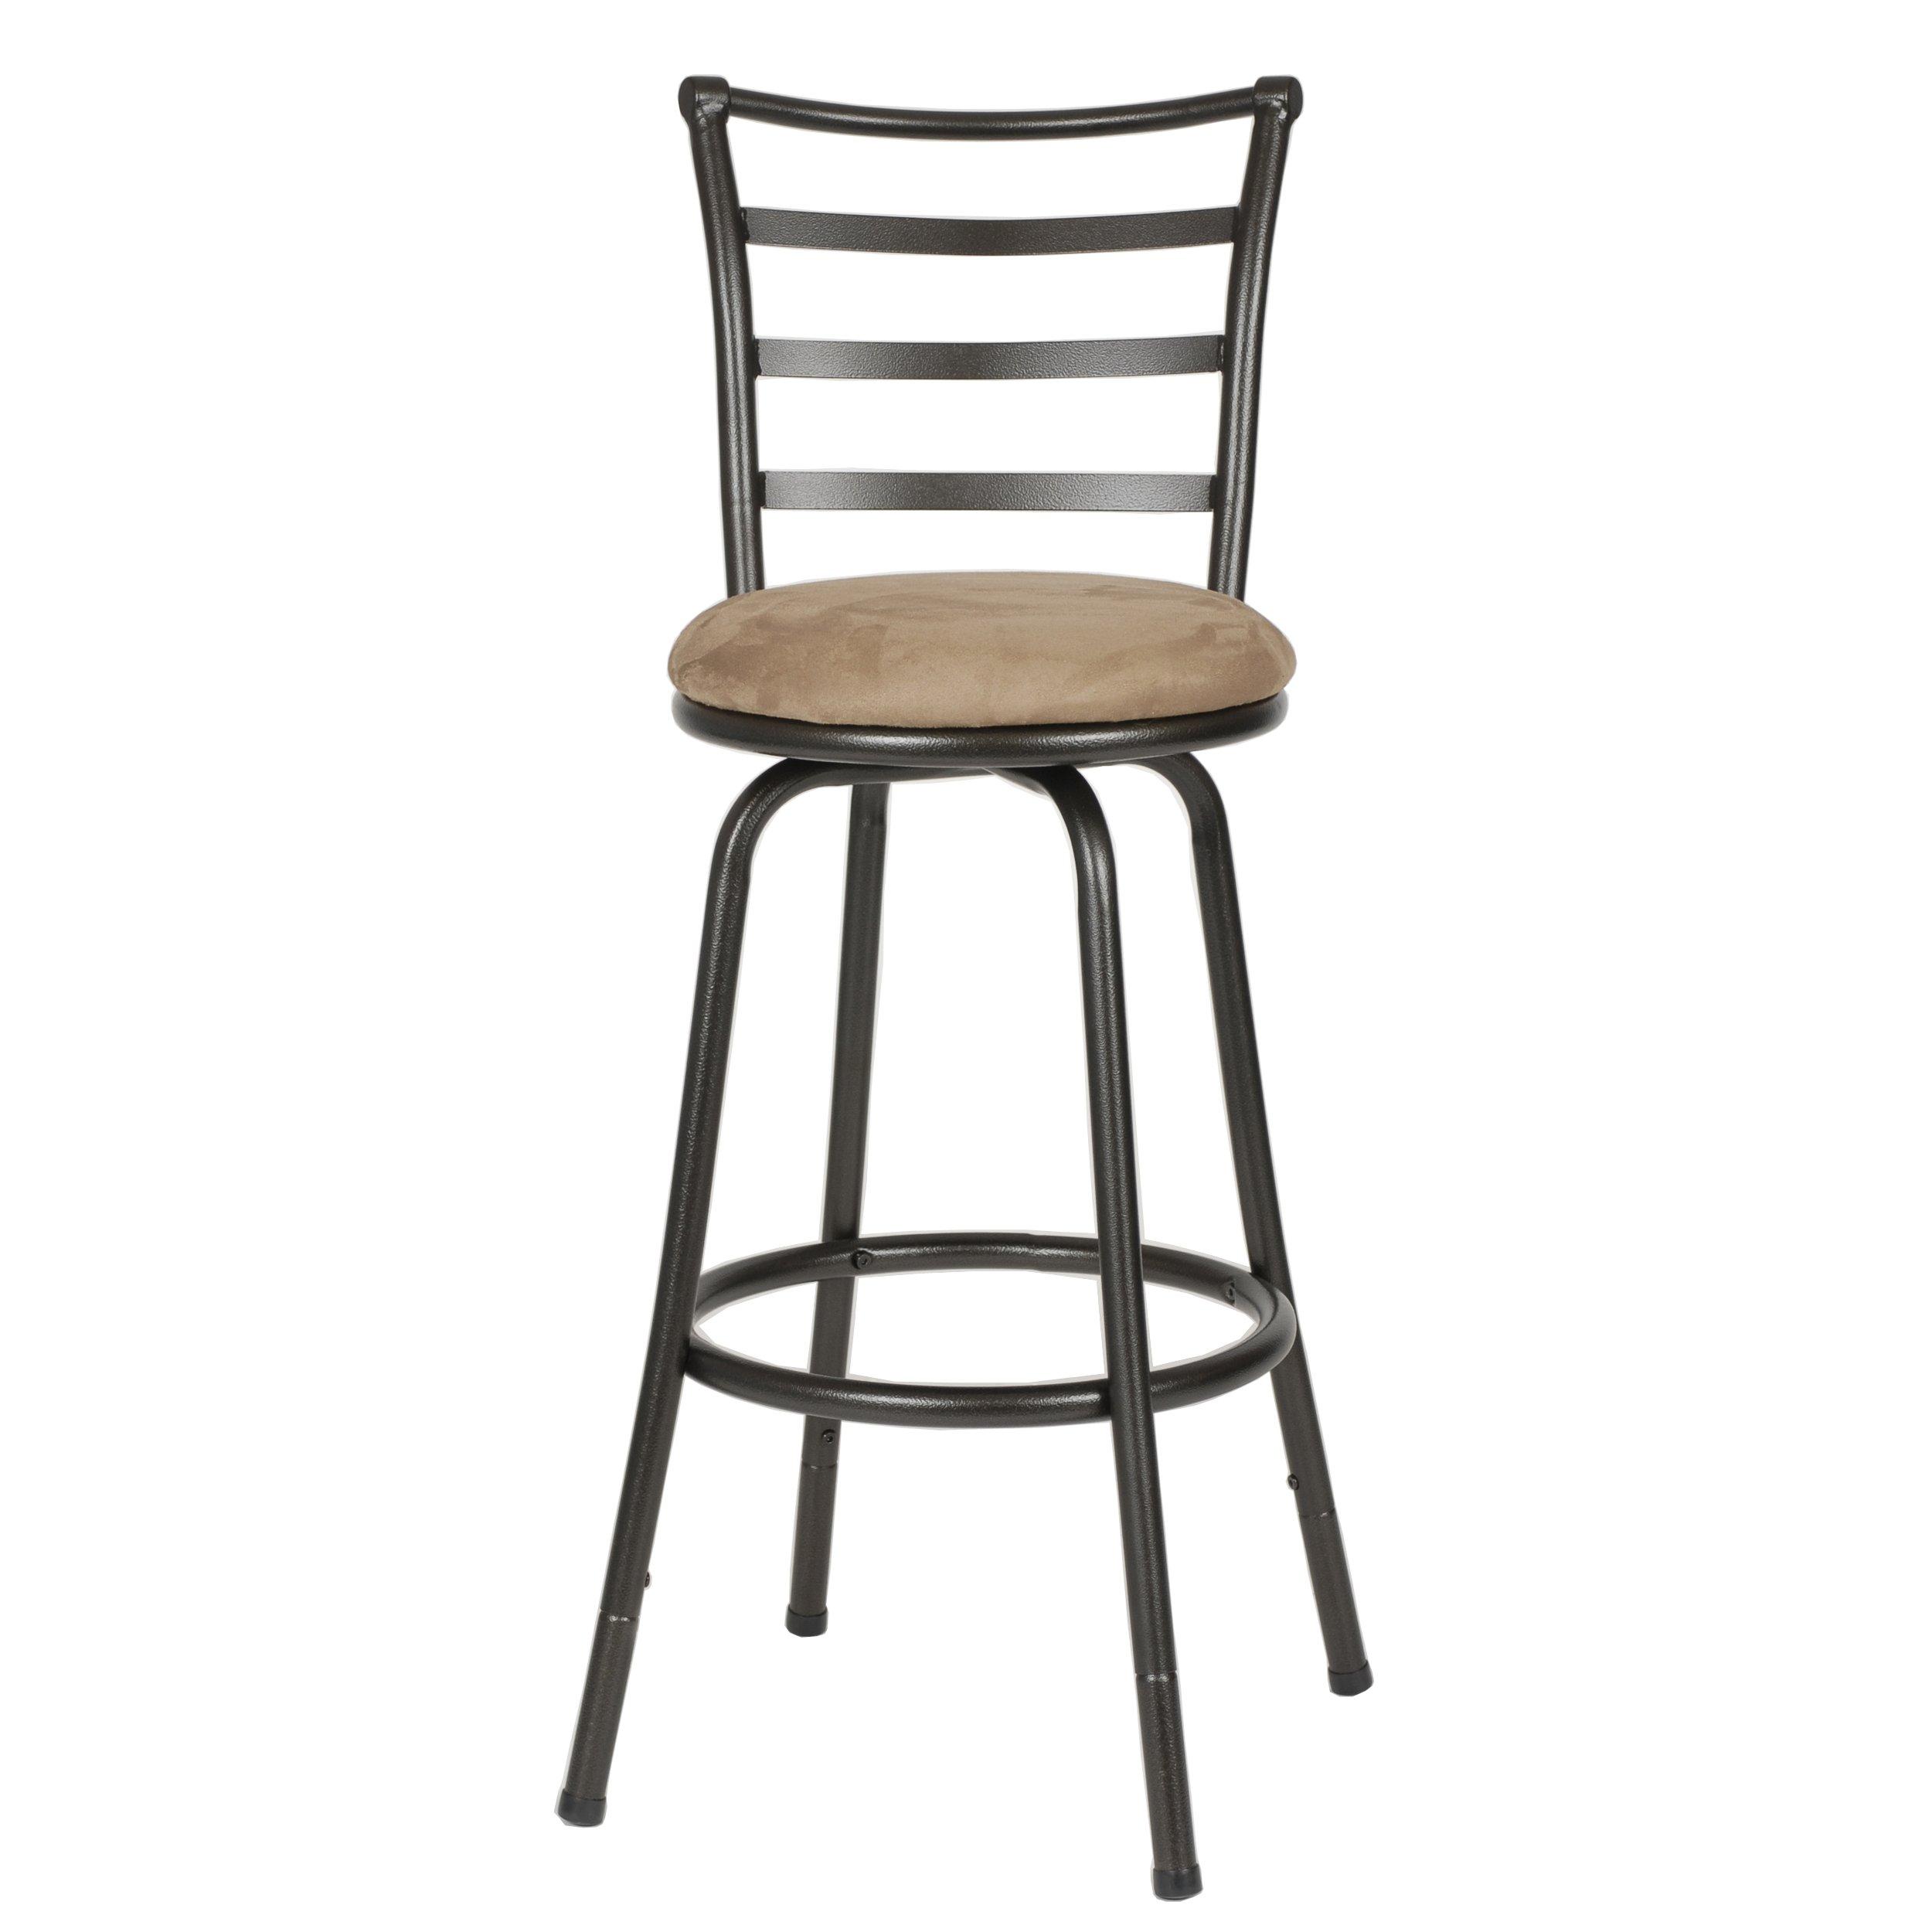 Roundhill Furniture Round Seat Bar/Counter Height Adjustable Metal Bar Stool, Metallic by Roundhill Furniture